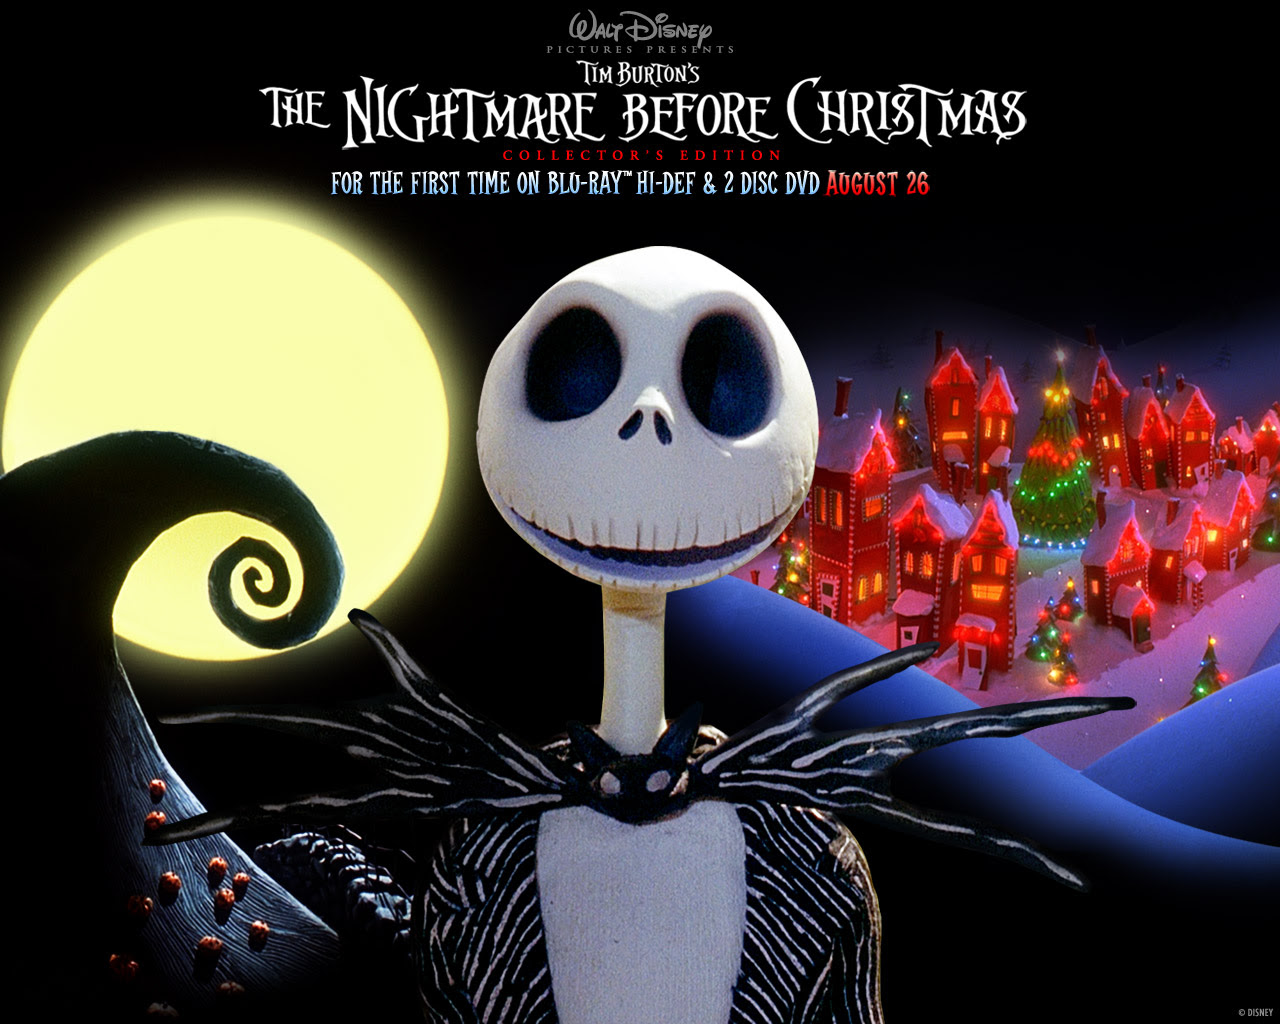 Nbc Nightmare Before Christmas Wallpaper 25437044 Fanpop